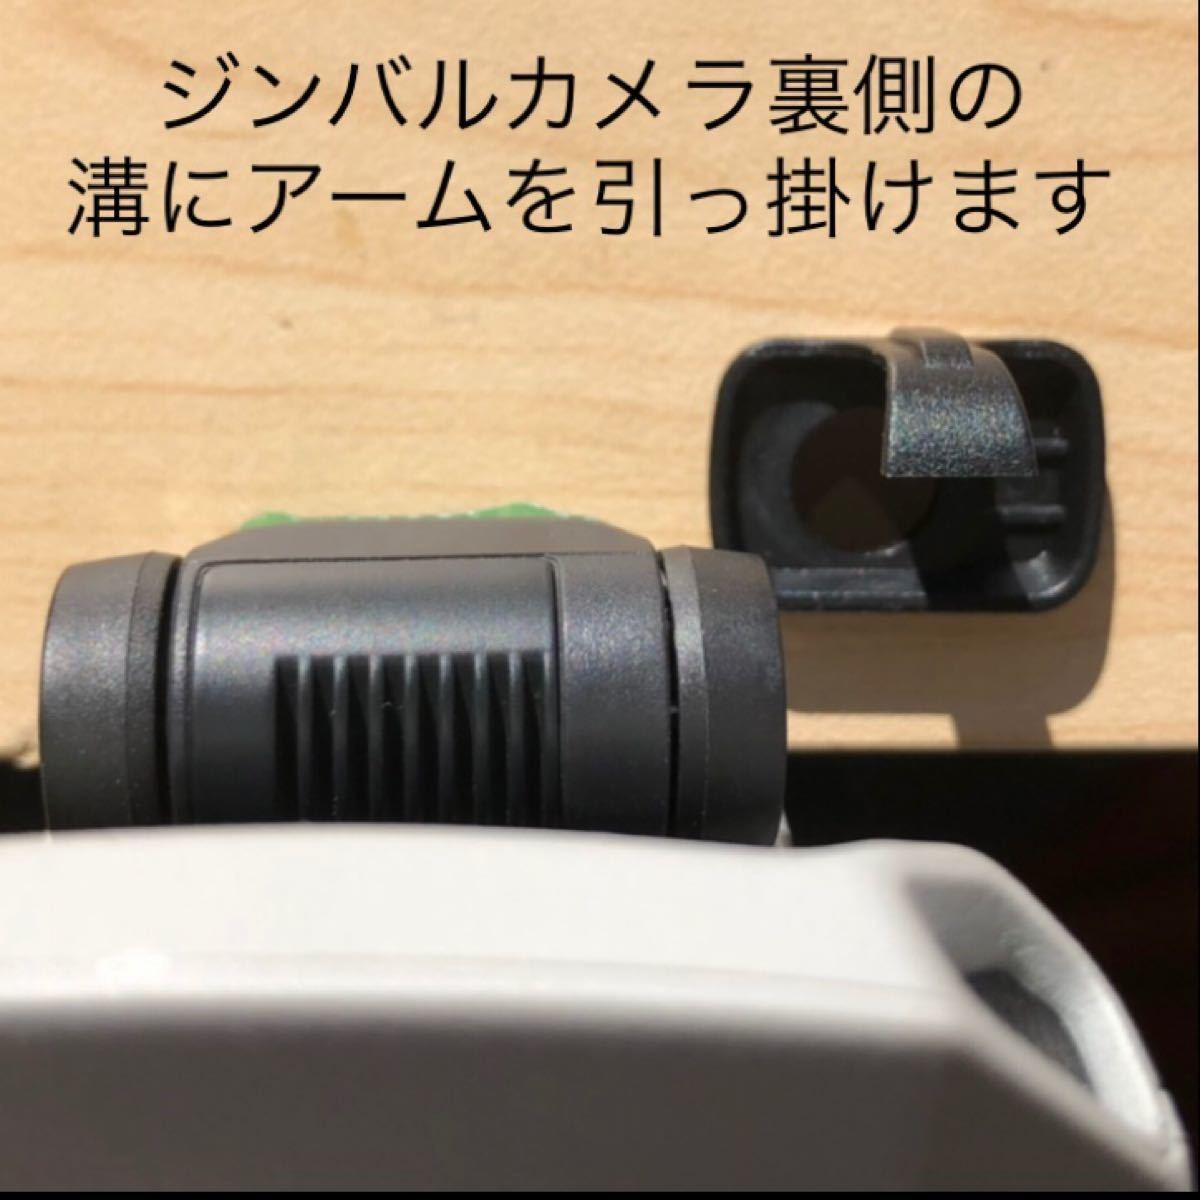 ☆ND32レンズフィルター★MAVIC MINI / DJI MINI 2